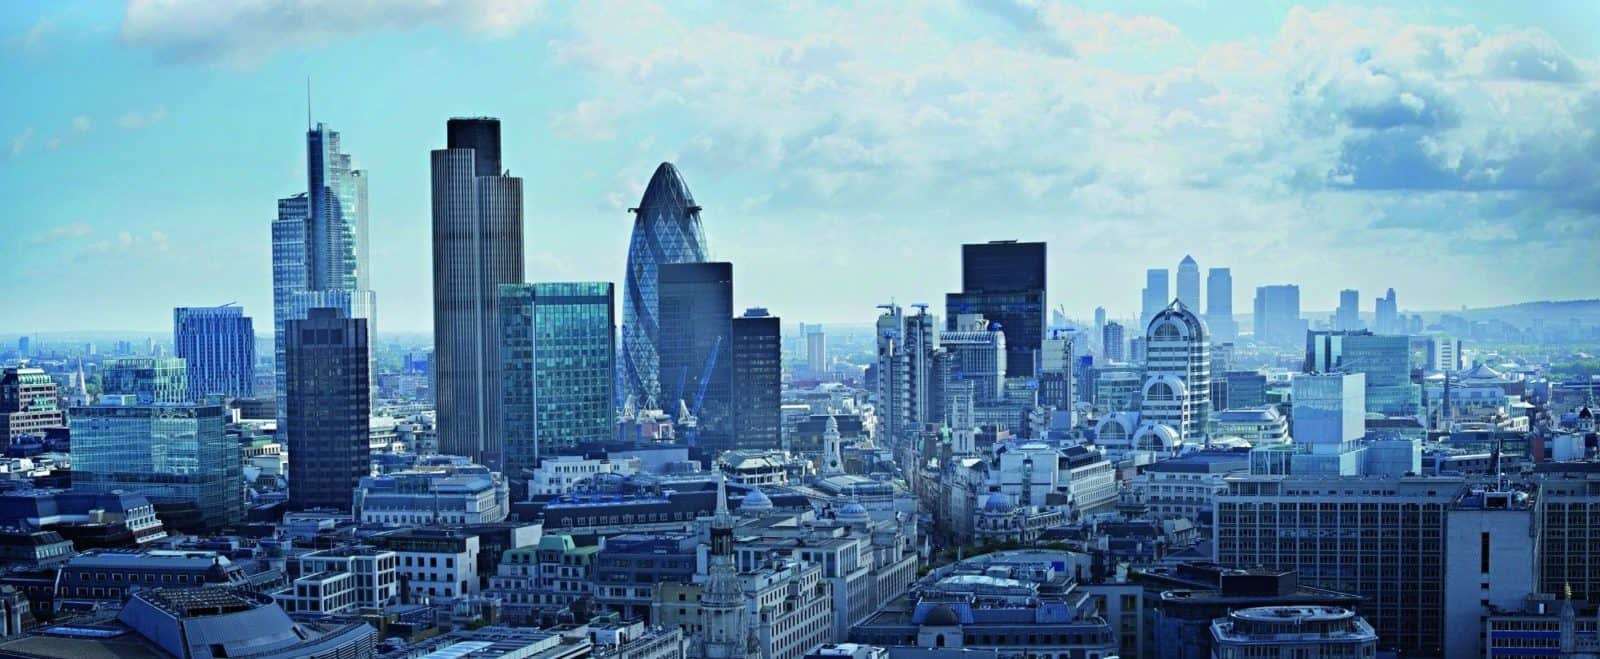 compliance-consultancy-london-compliance-consultancy-services-compliance-consultants-uk